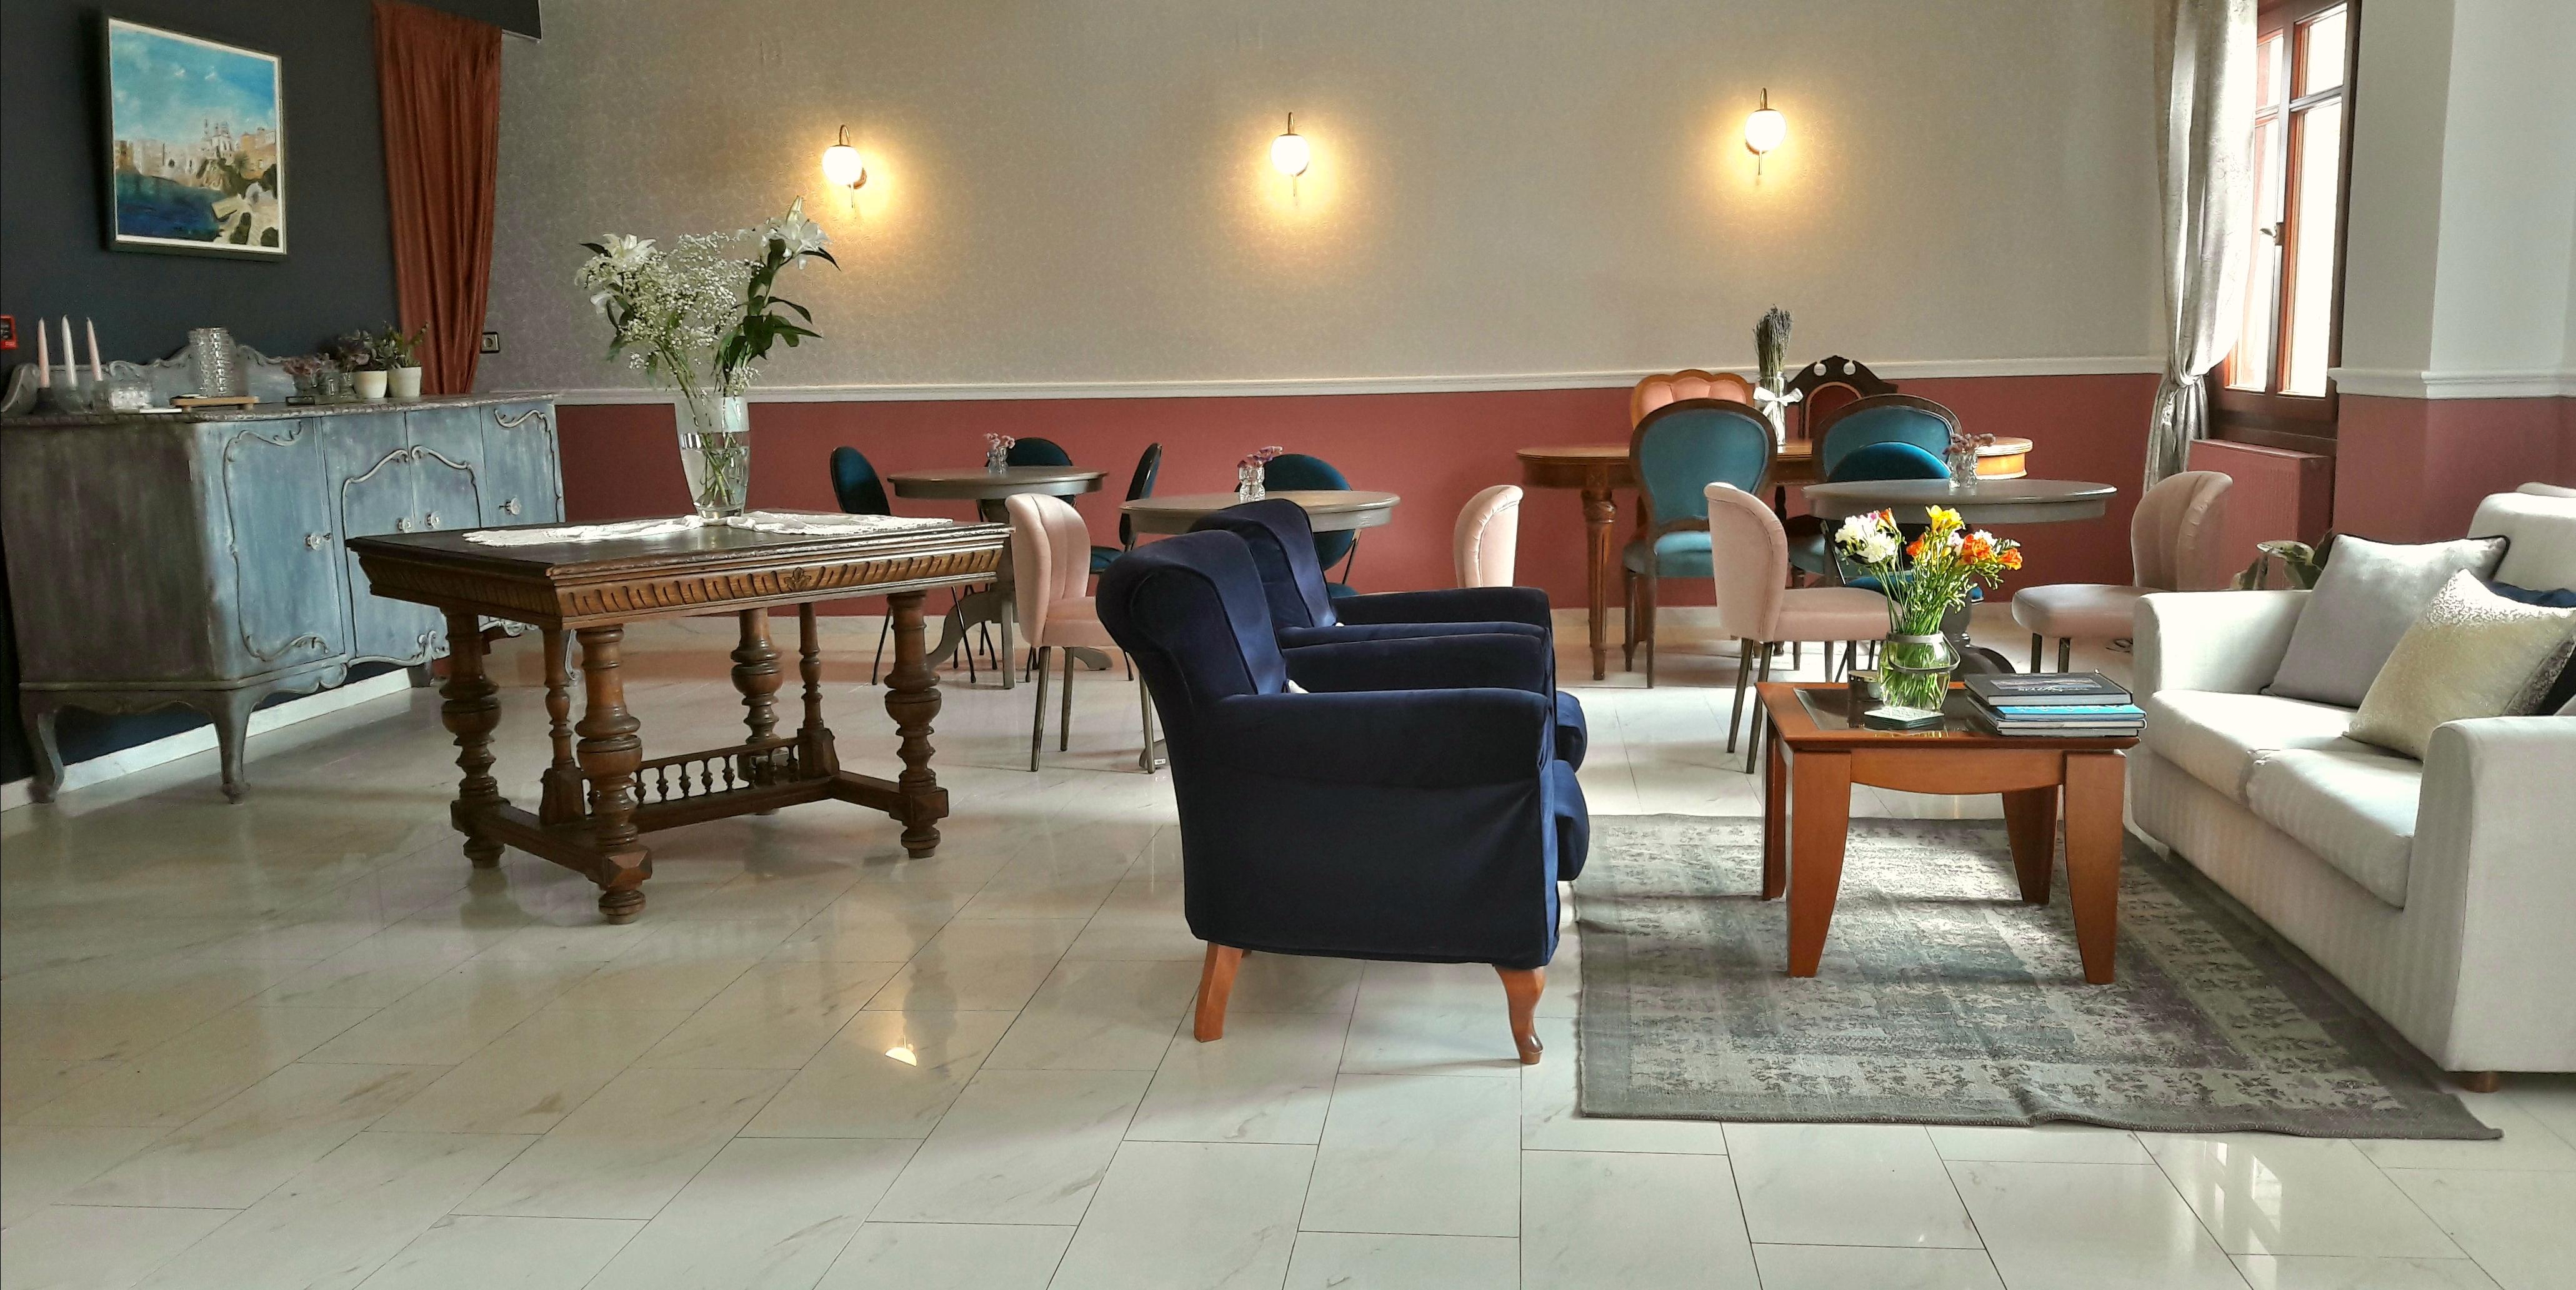 Electra Syros ξενοδοχείο: διαμονή σύρος, ερμούπολη ξενοδοχείο, κατάλυμα σύρος, βαπόρια σύρος